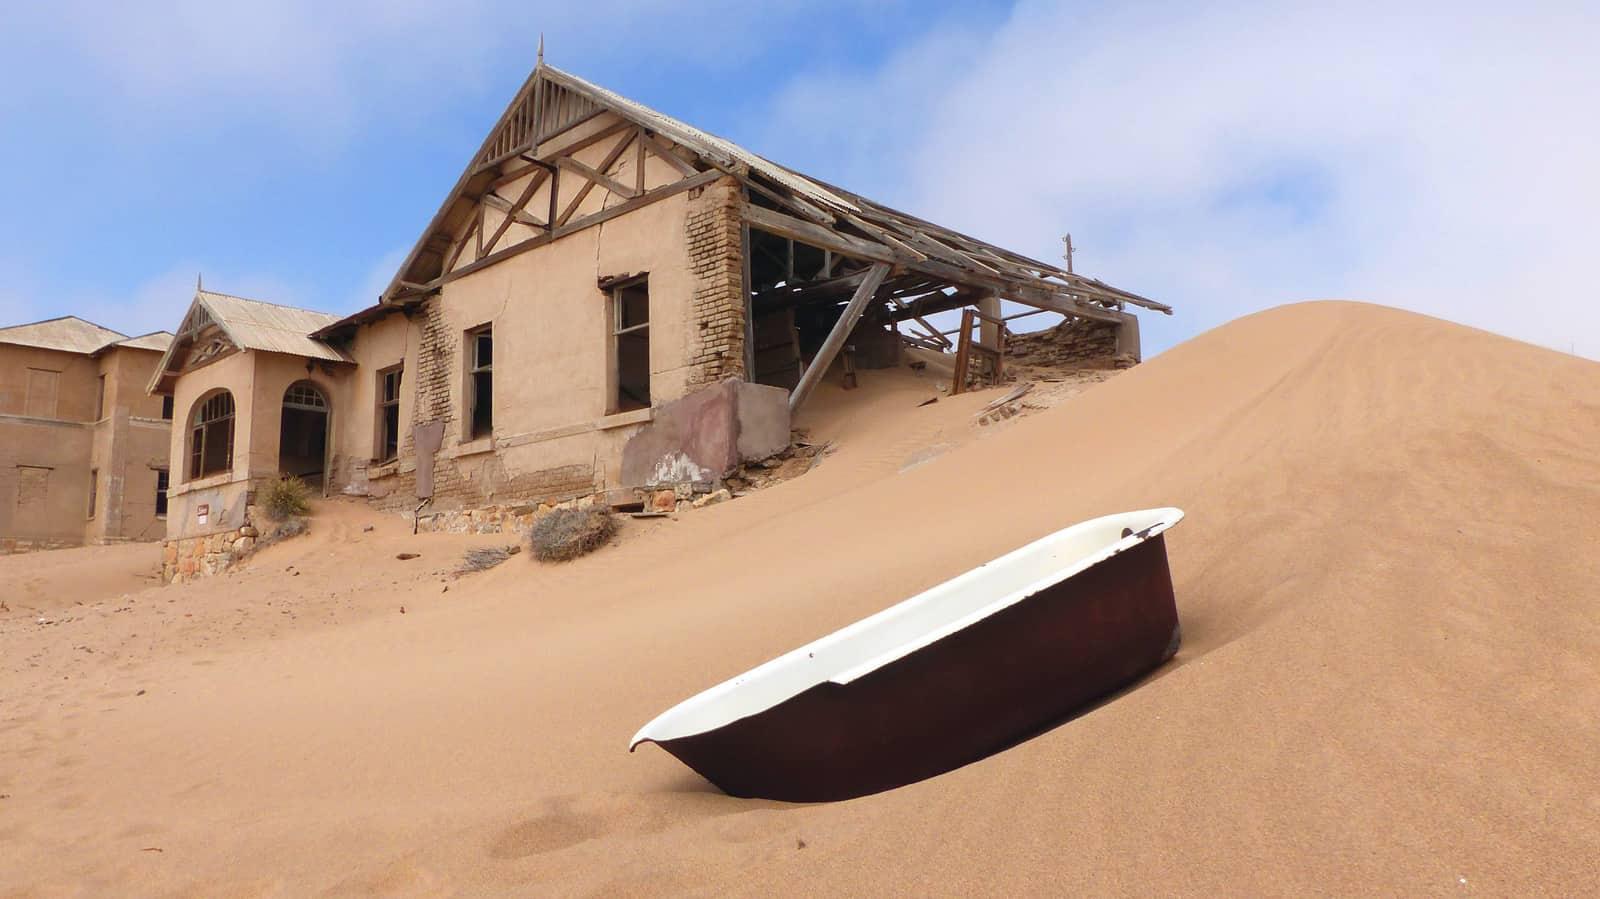 Kolmanskop Sand Dune + Bath Tub